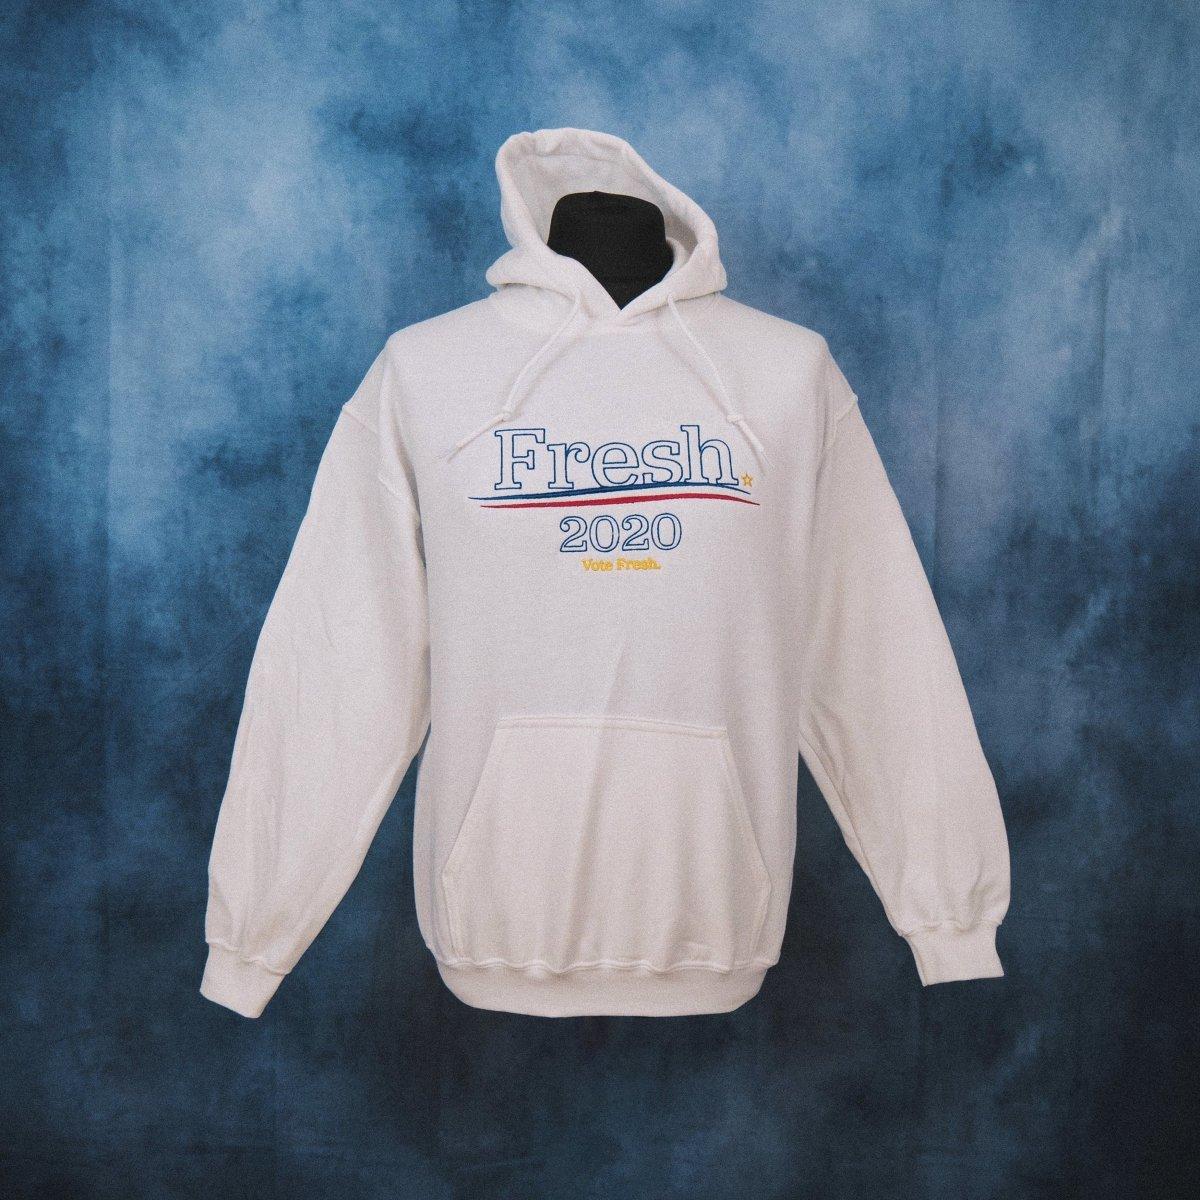 Fresh 2020 Unisex Embroidered Hoodie